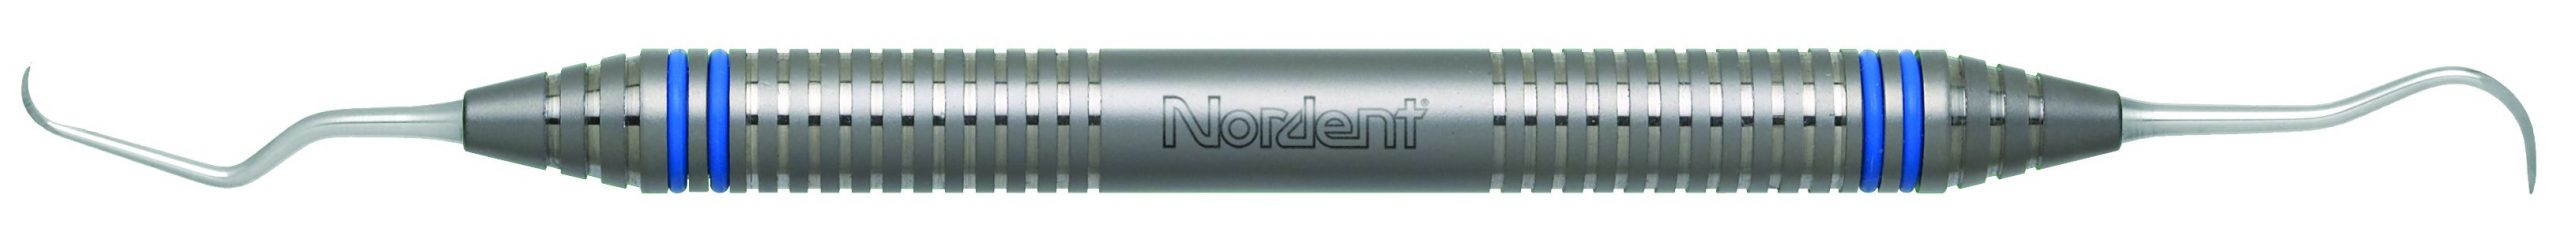 N137 Mini Blade - Long Shank Scalette®